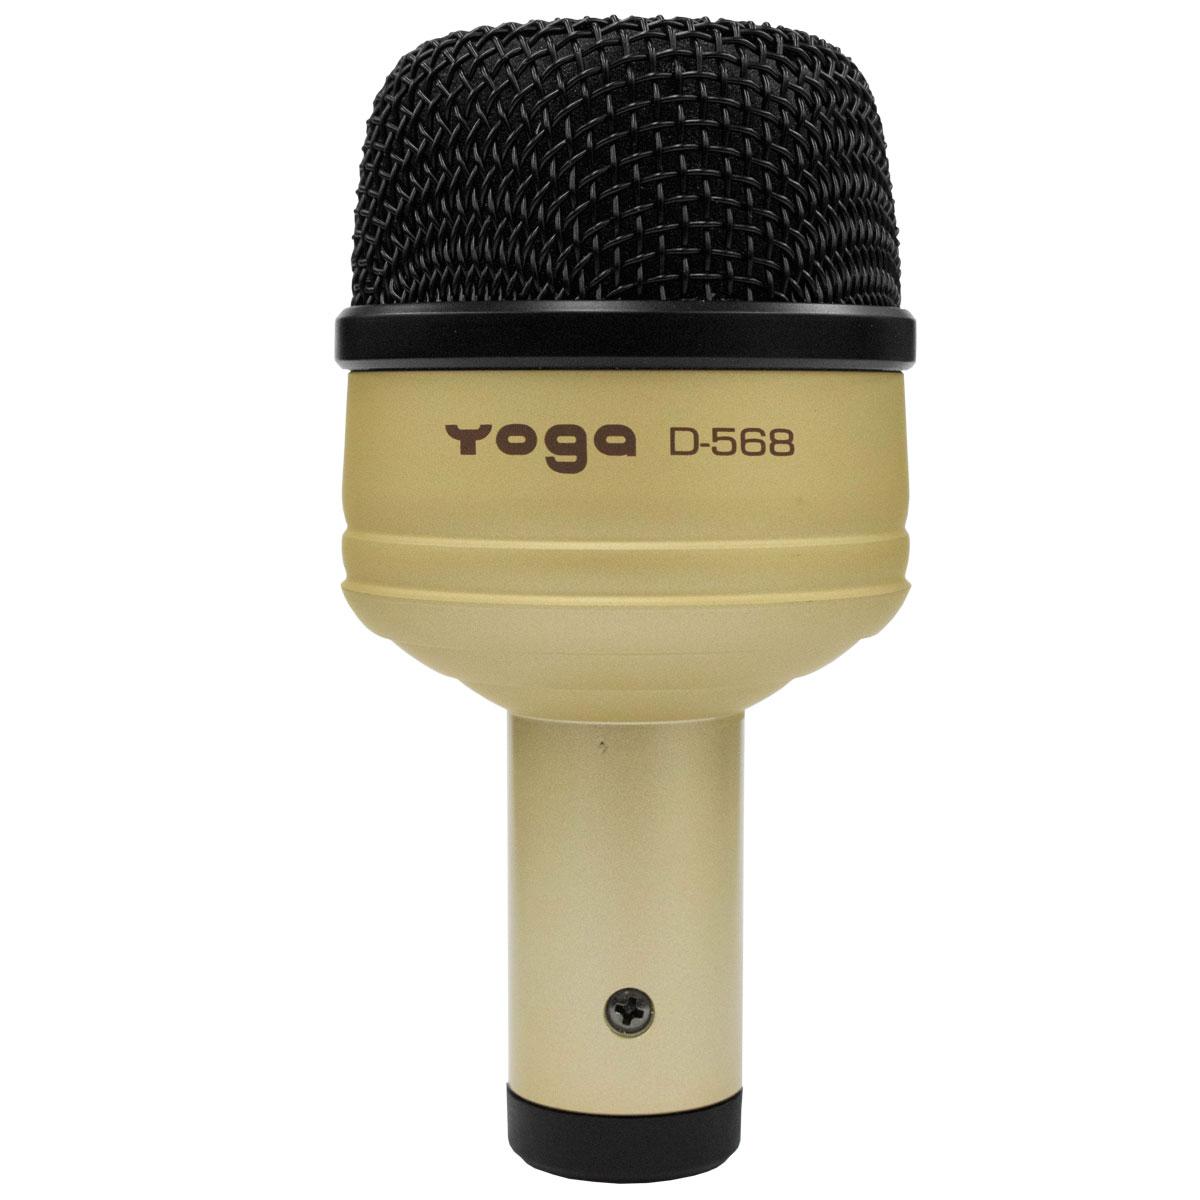 Microfone c/ Fio p/ Bumbo de Bateria - D 568 Yoga